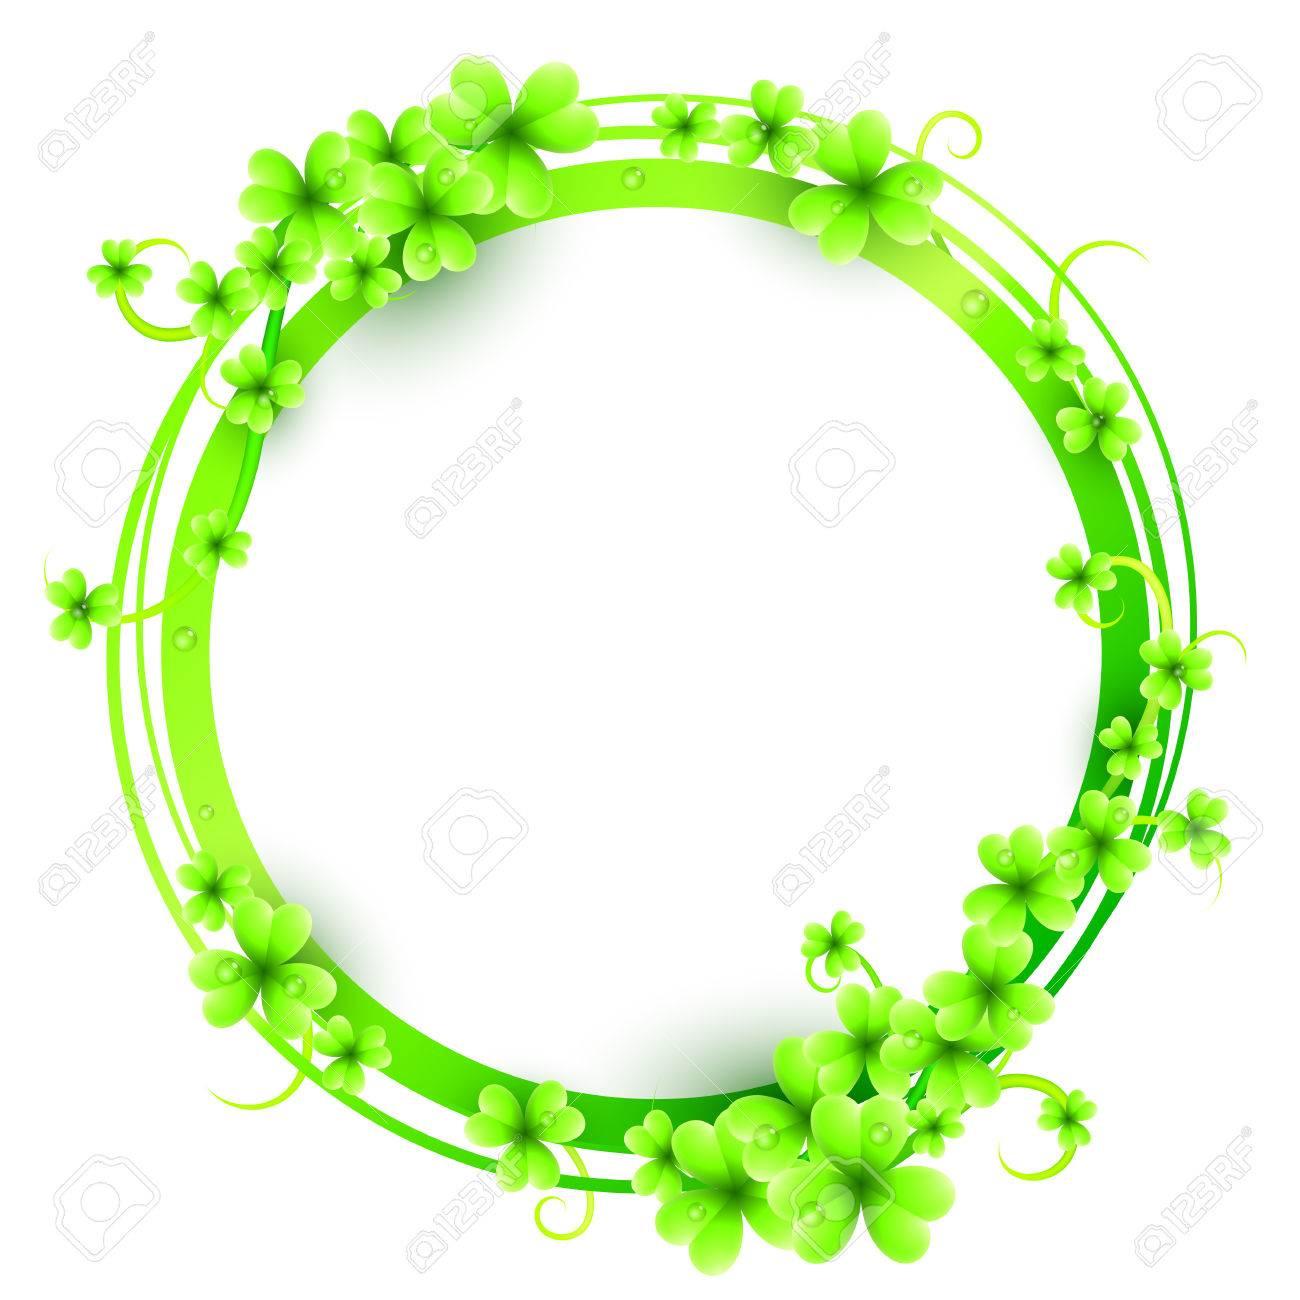 St. Patricks Tag Rahmen Mit Grünen Kleeblättern Verziert Lizenzfrei ...